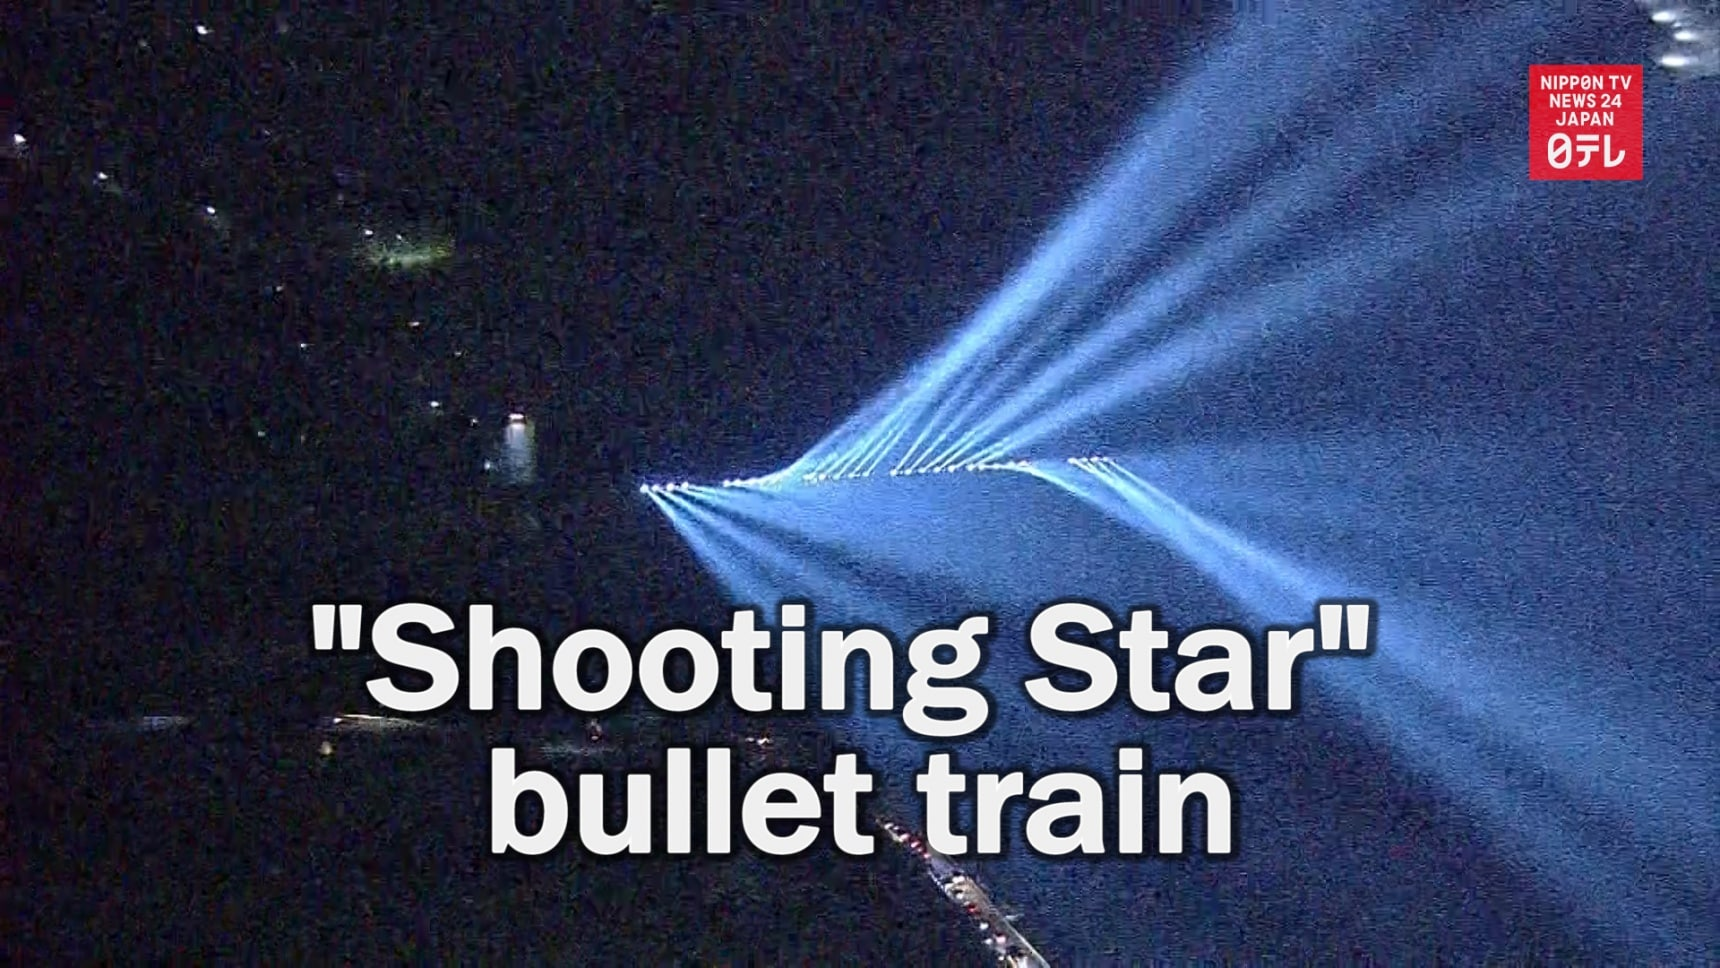 'Shooting Star' Bullet Train